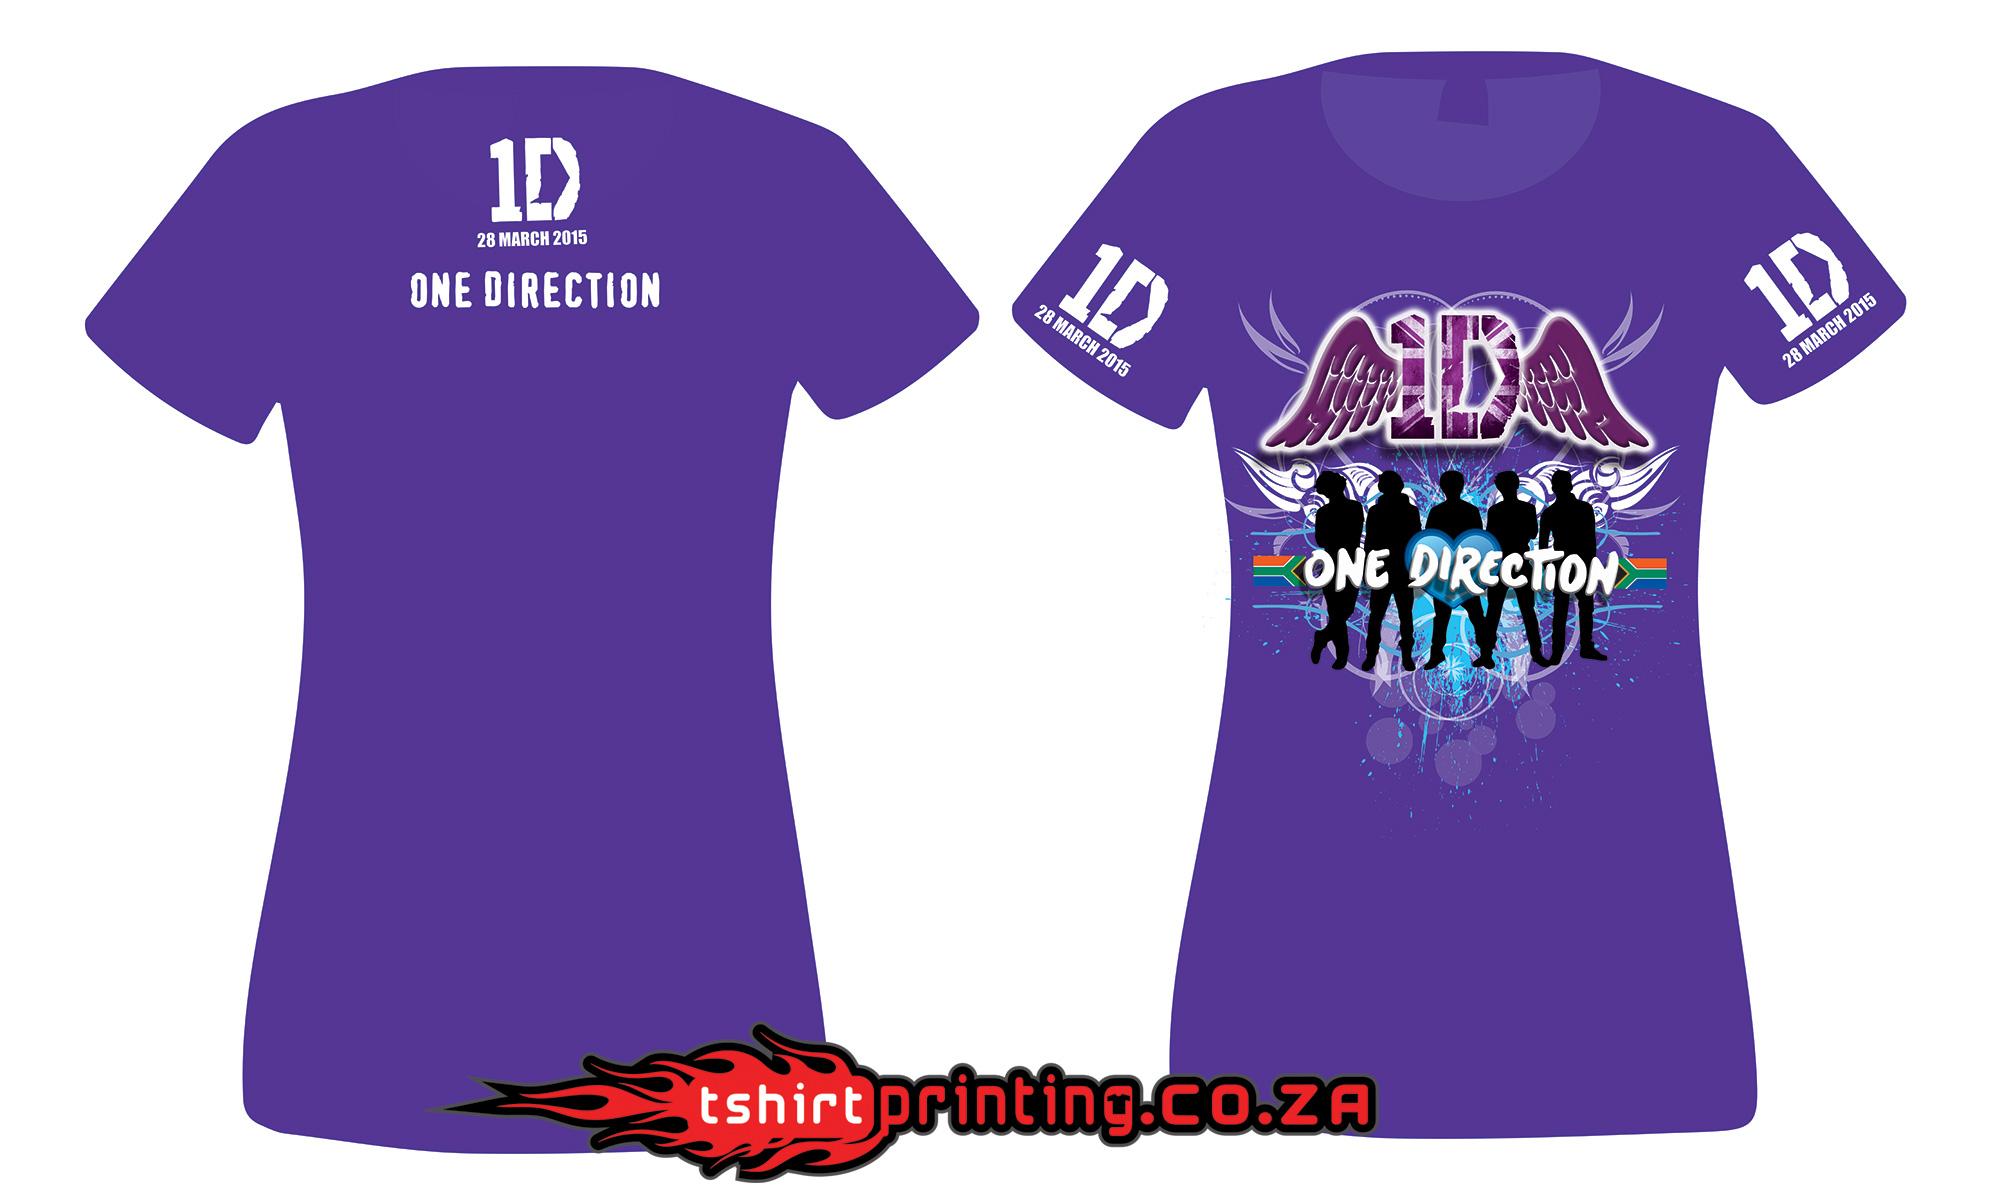 1direction custom fan shirt design t shirt printing for Custom shirt printing online